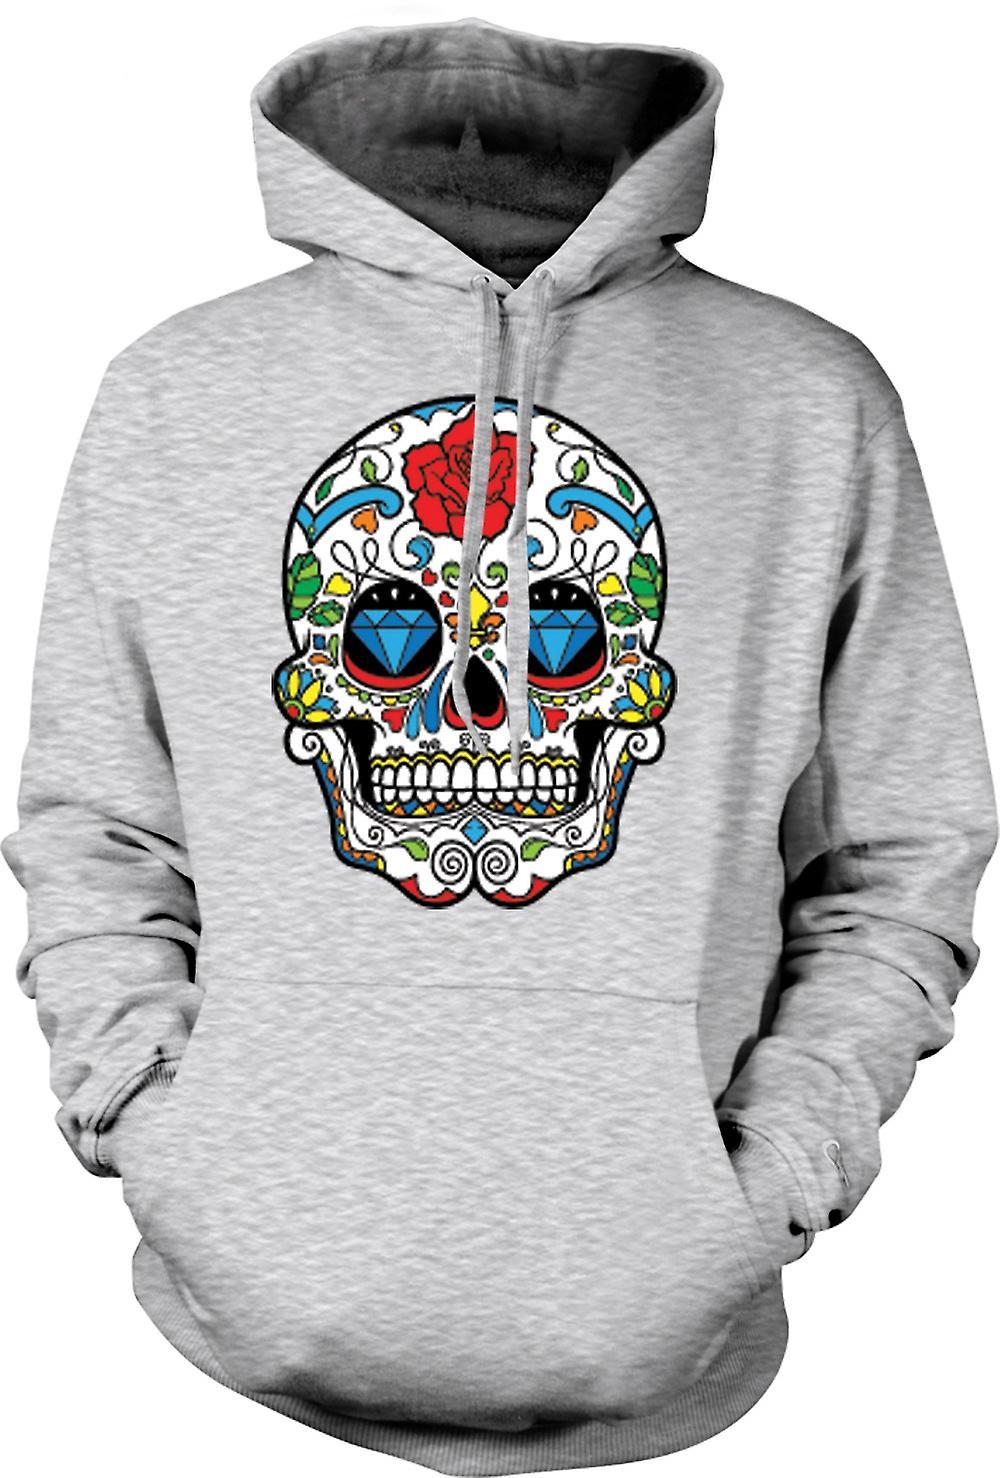 Mens Hoodie - mexicaine de crâne de sucre - Dia de los Muertos